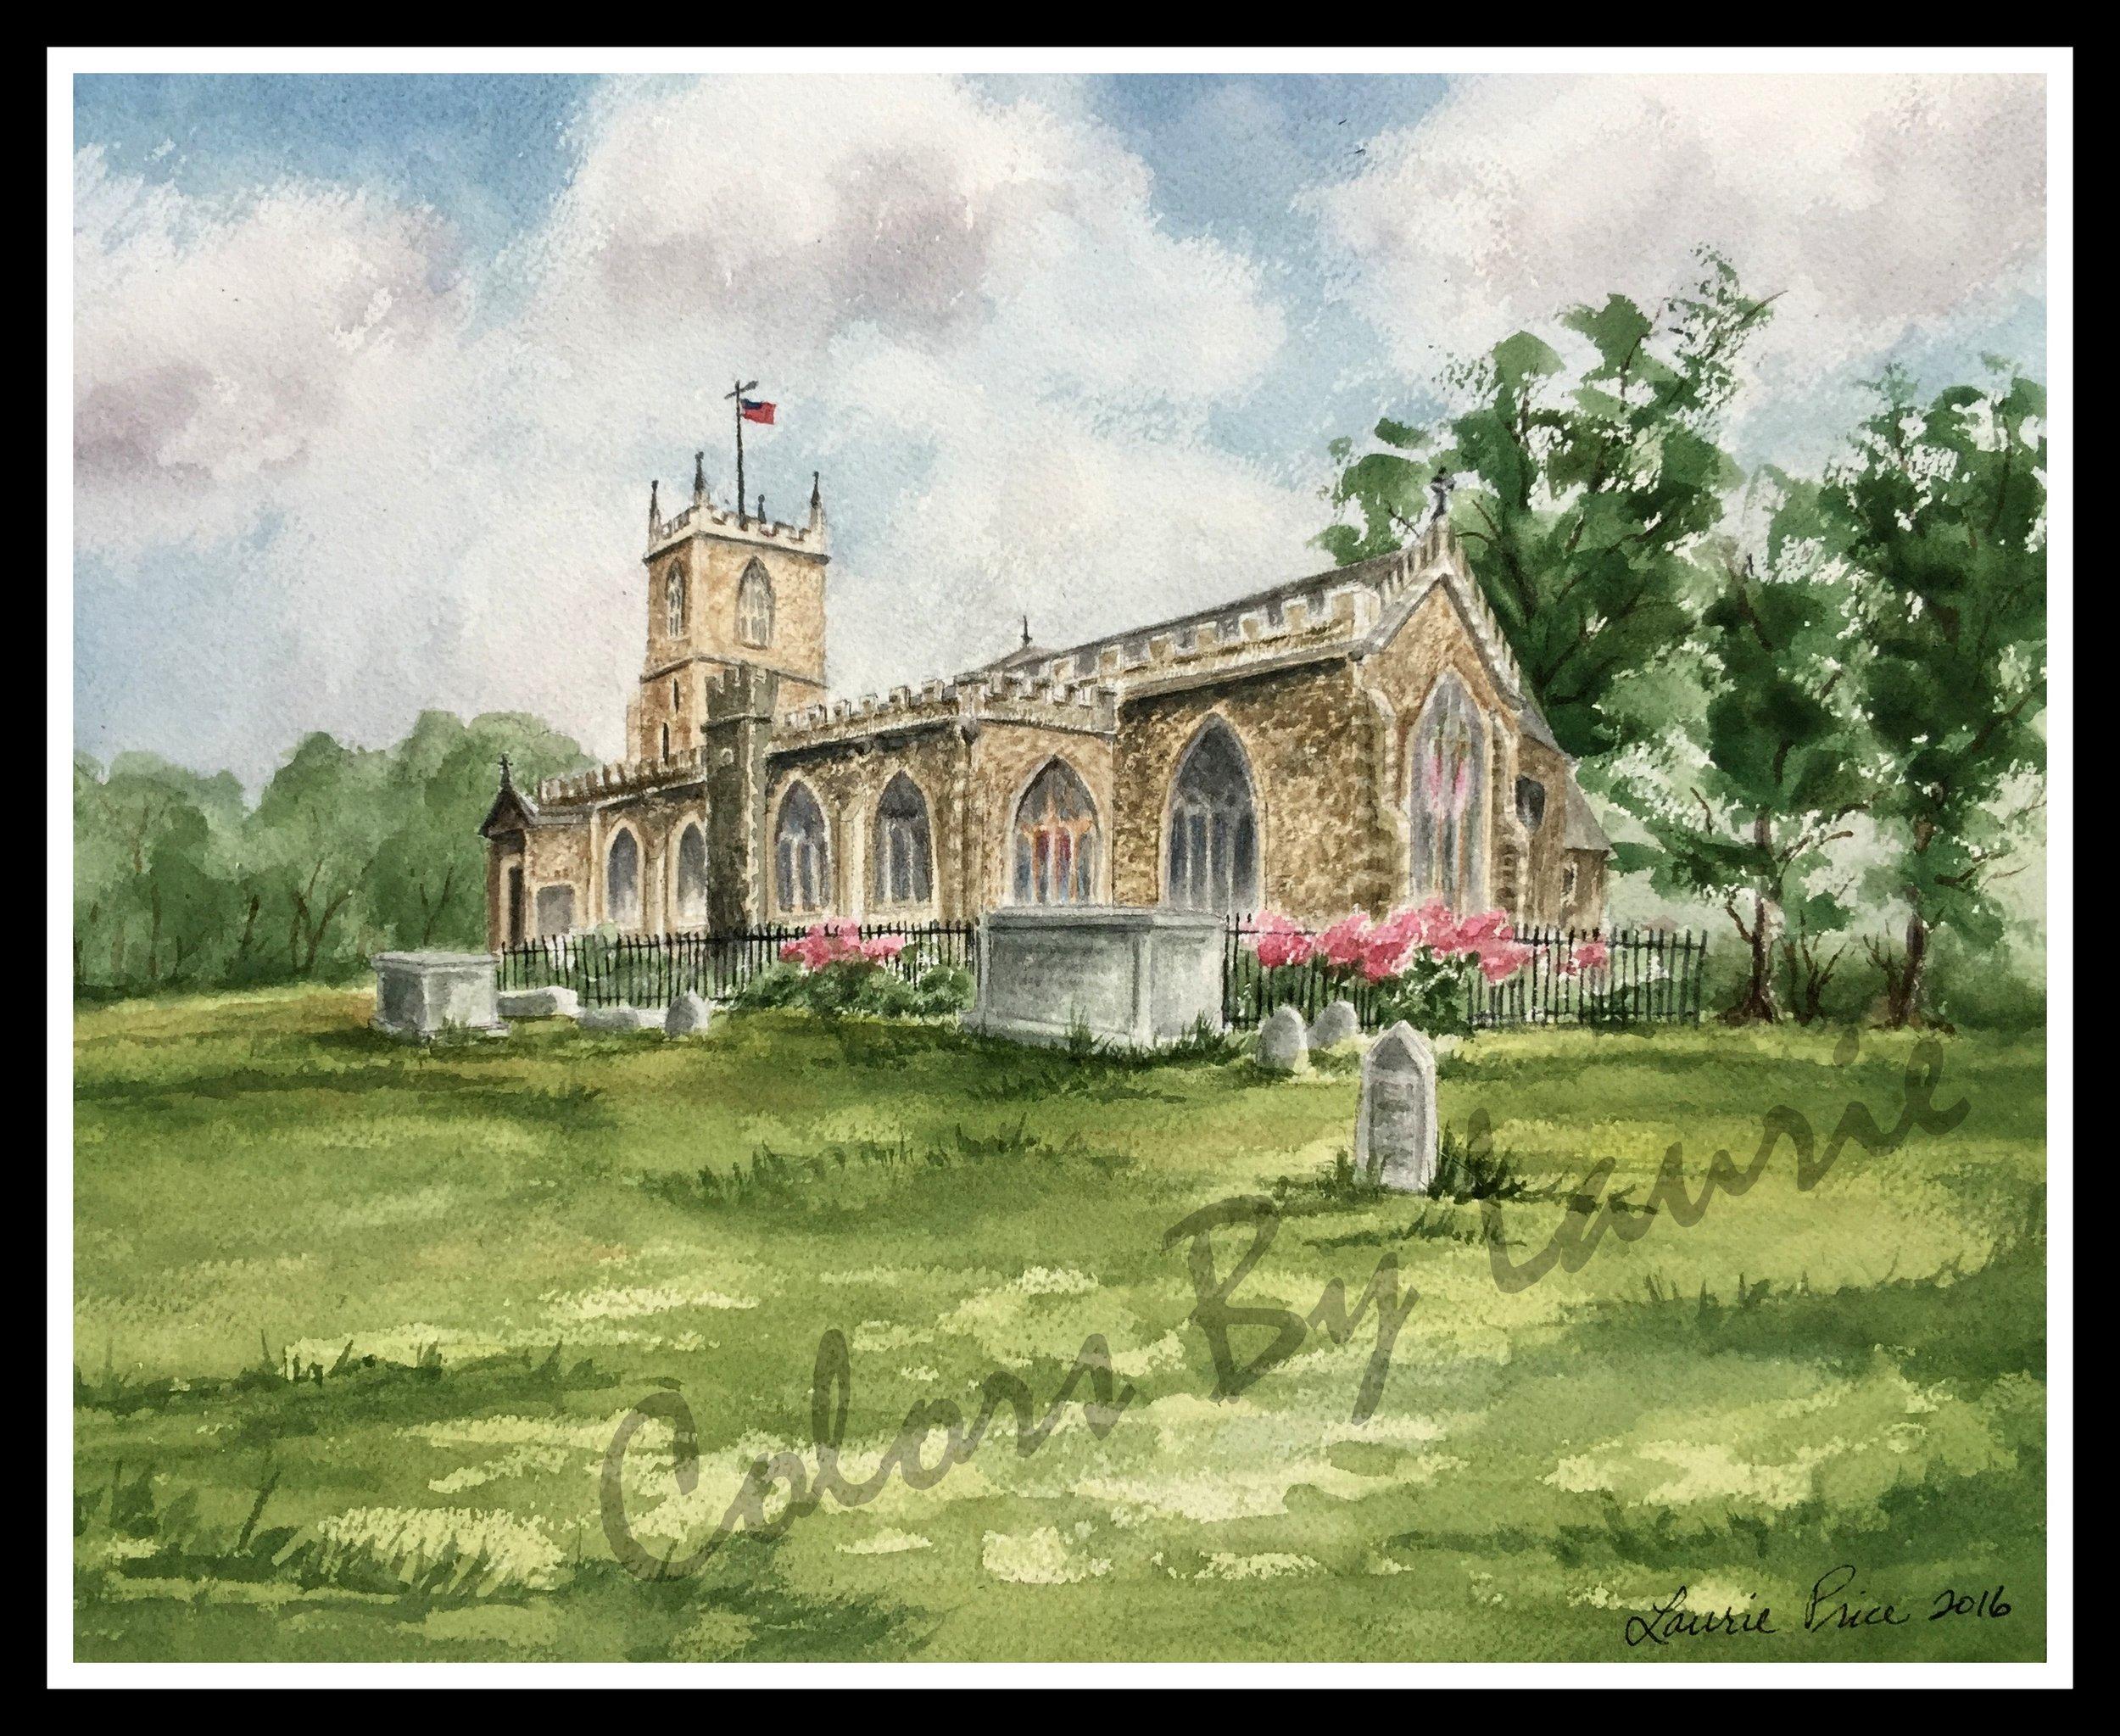 ST. DUNSTAN'S CHURCH, STEPNEY, LONDON